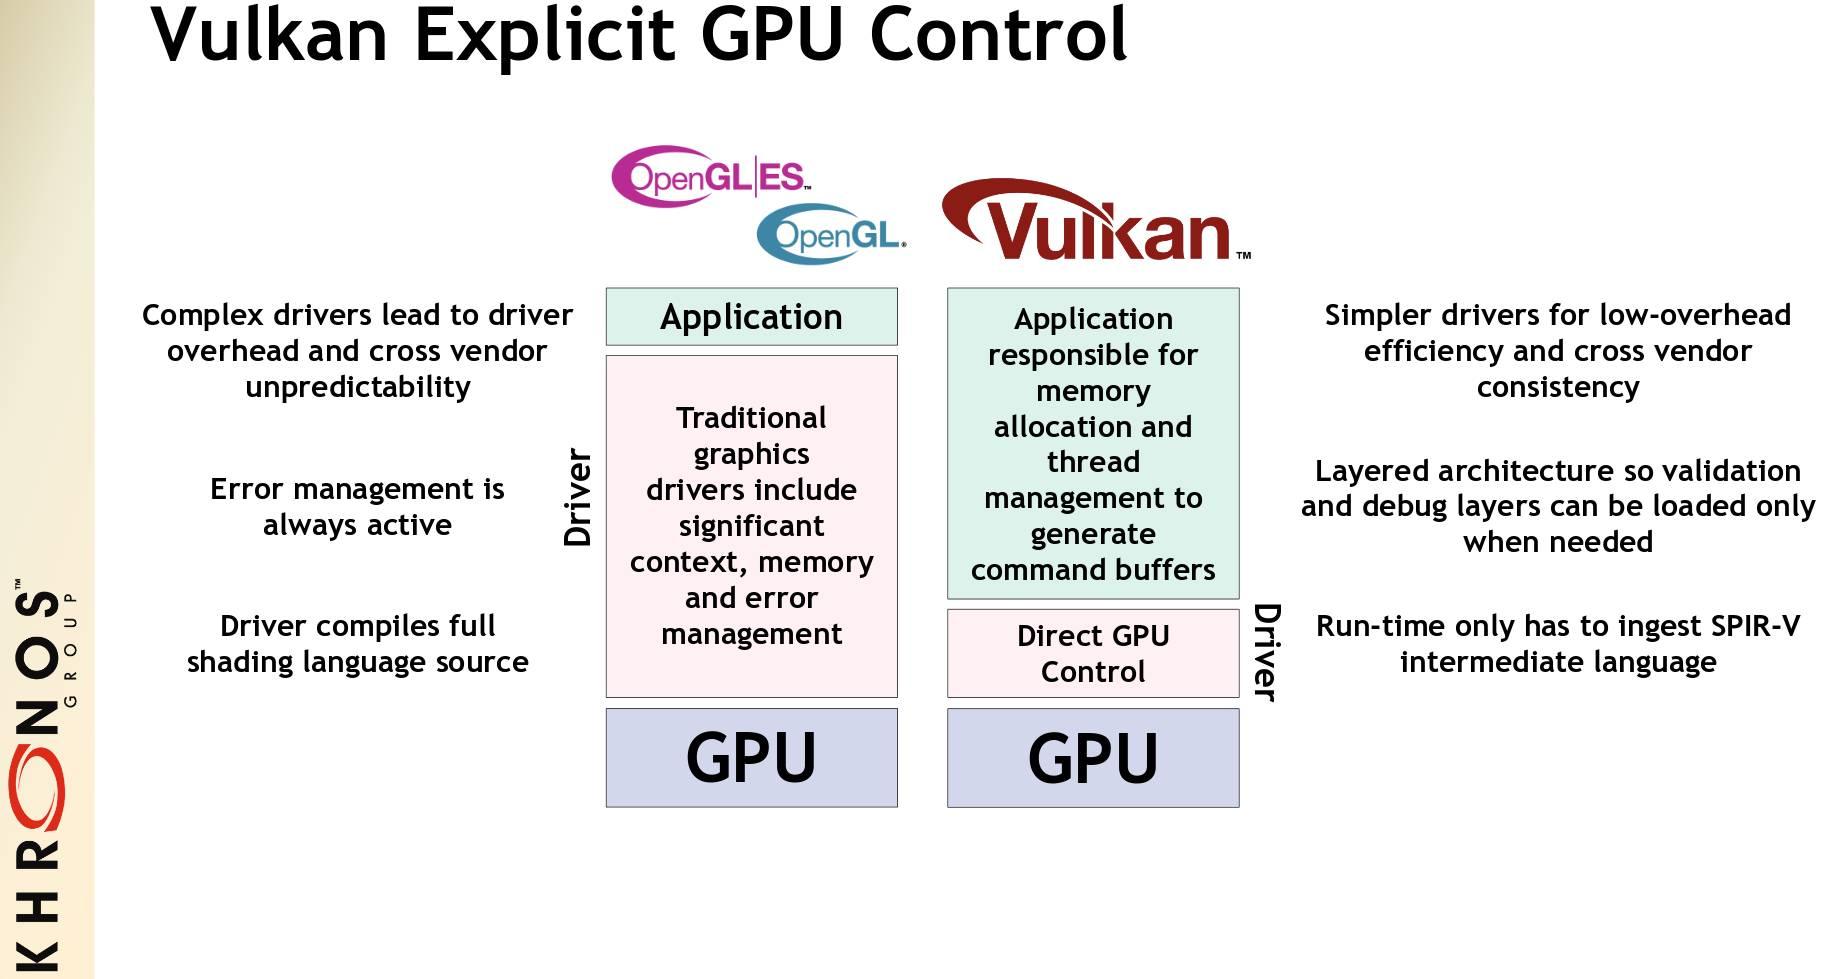 Manejo de la GPU por parte de Vulkan